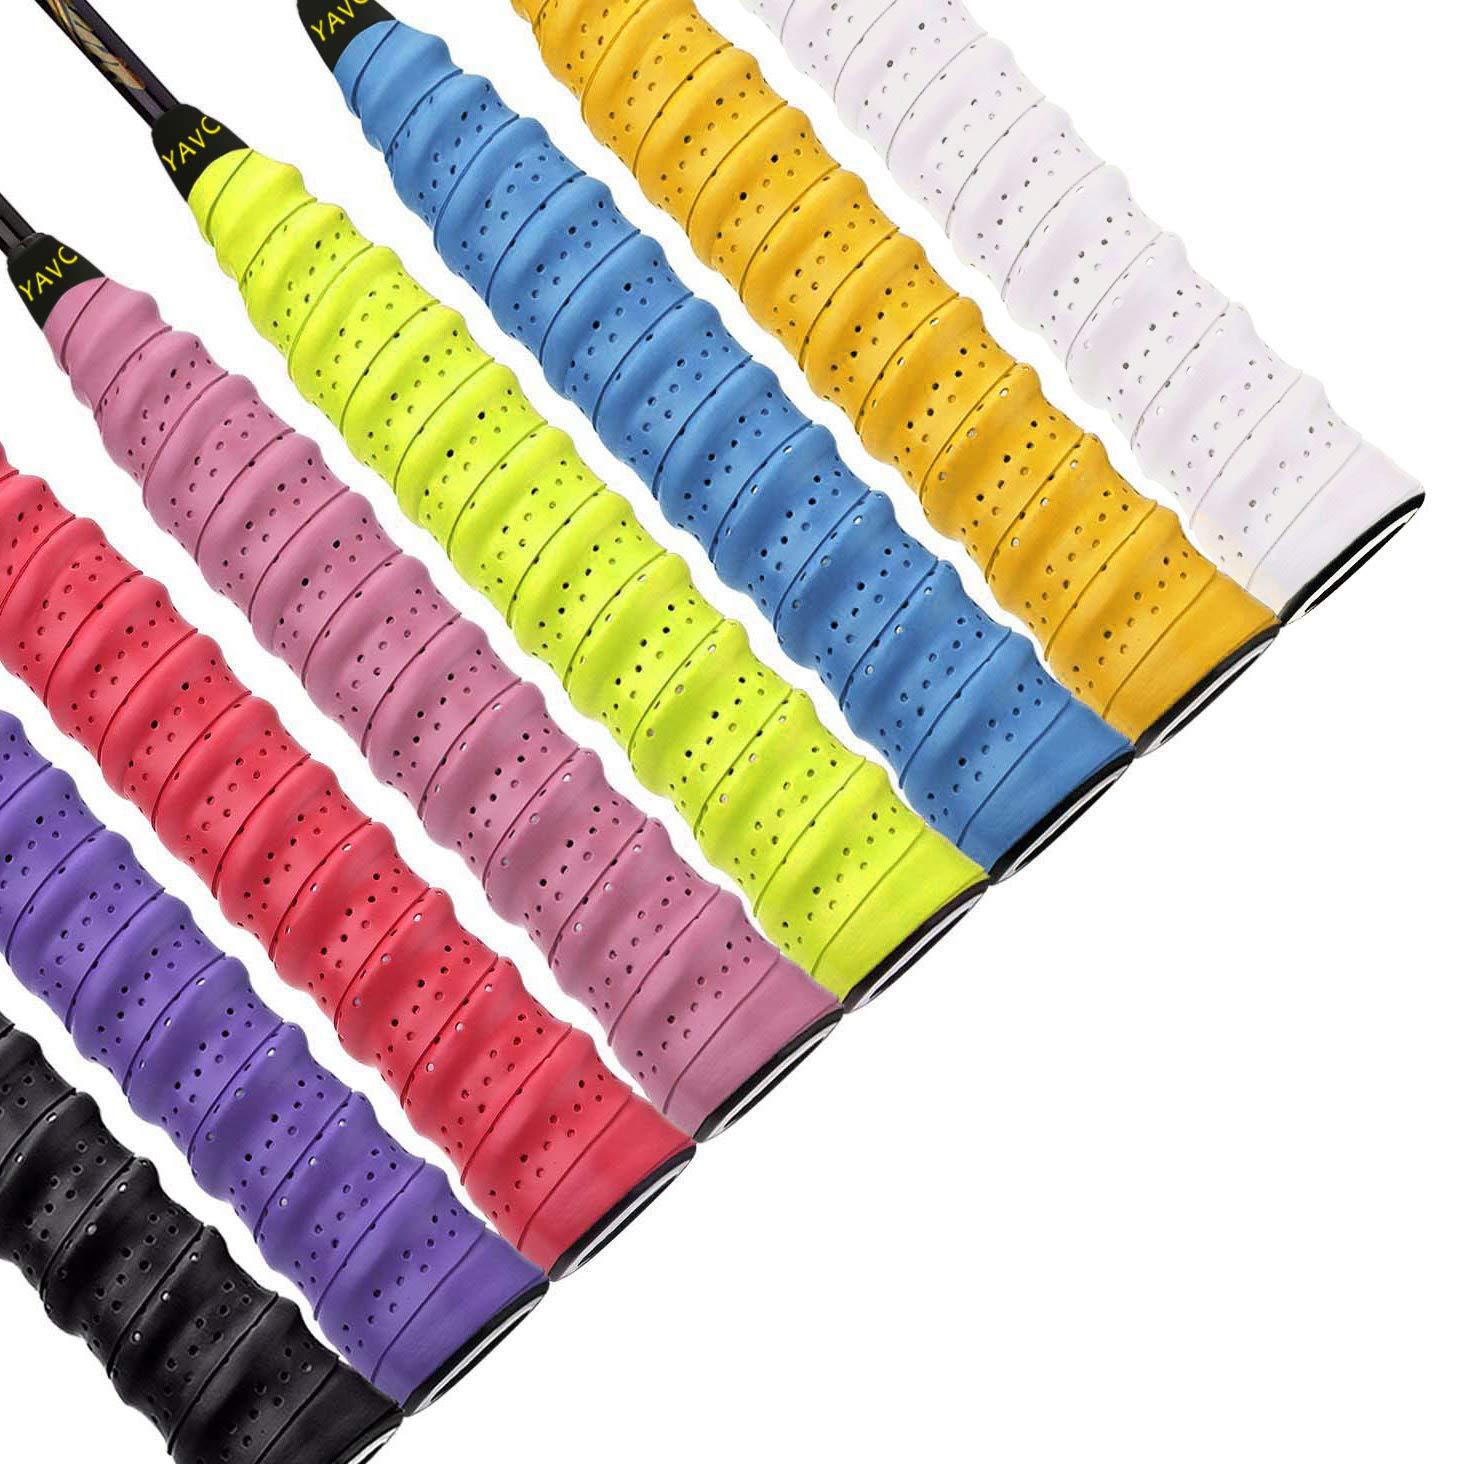 QH-Shop Mangos de Raquetas de Tennis Badminton Anti Slip Perforado ...